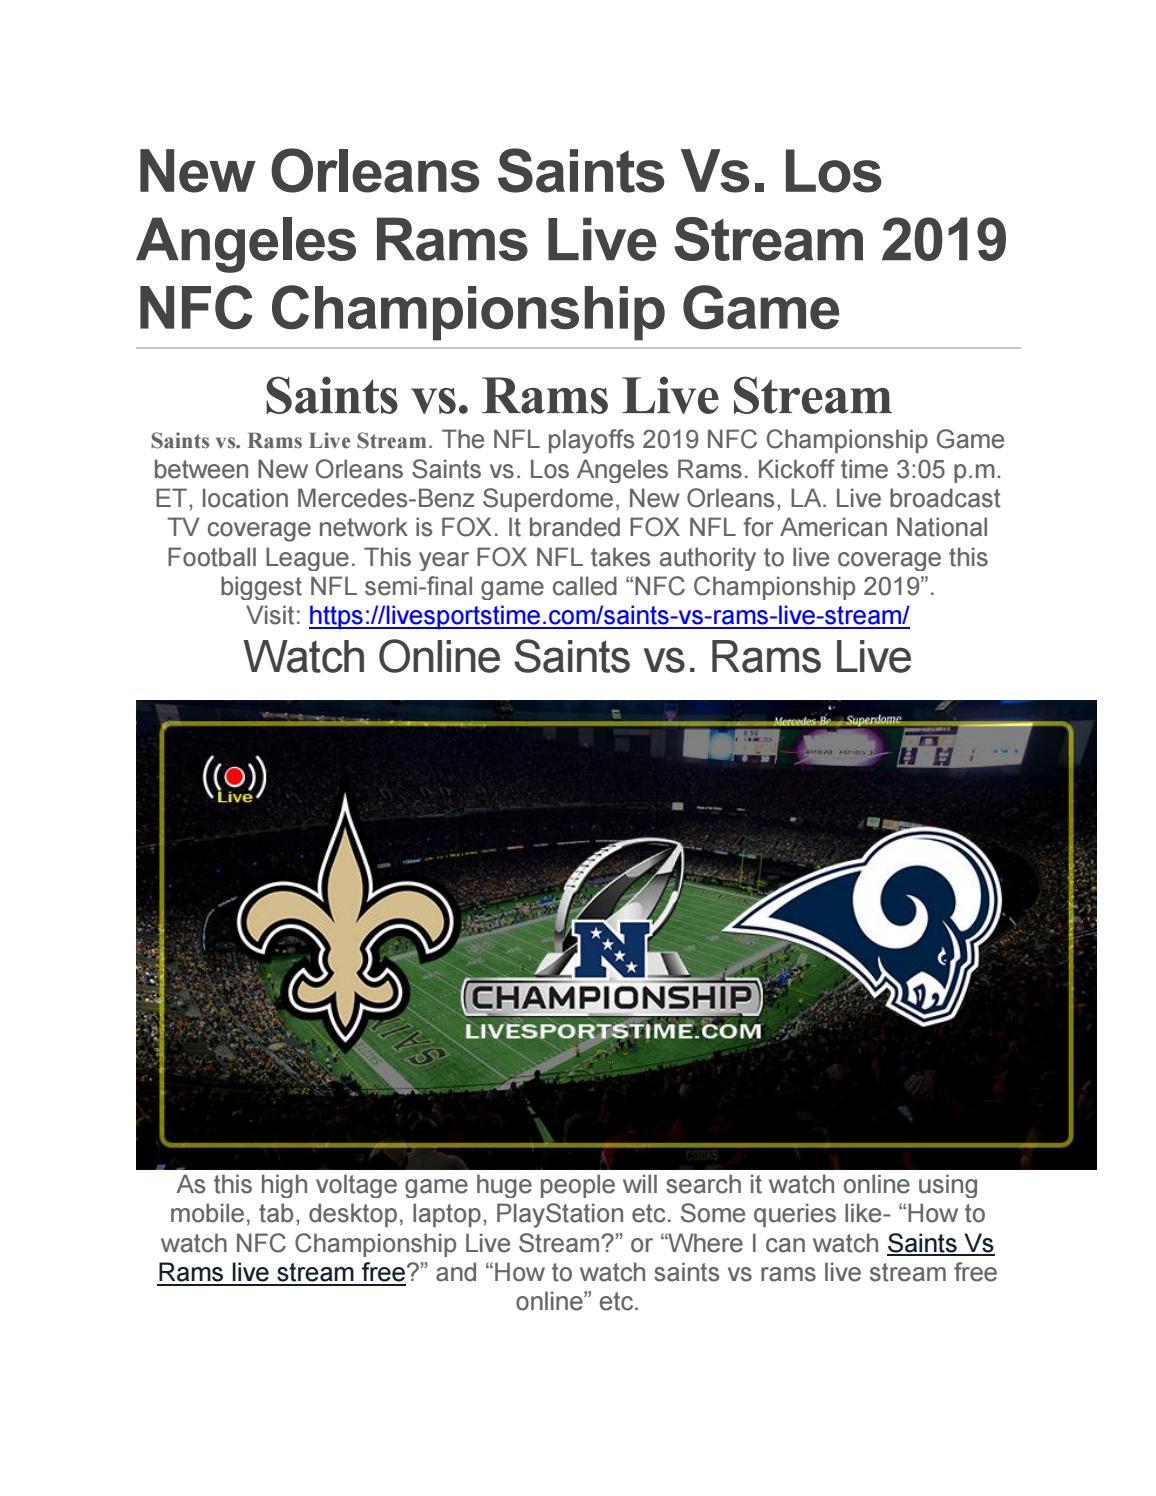 watch saints vs rams online free